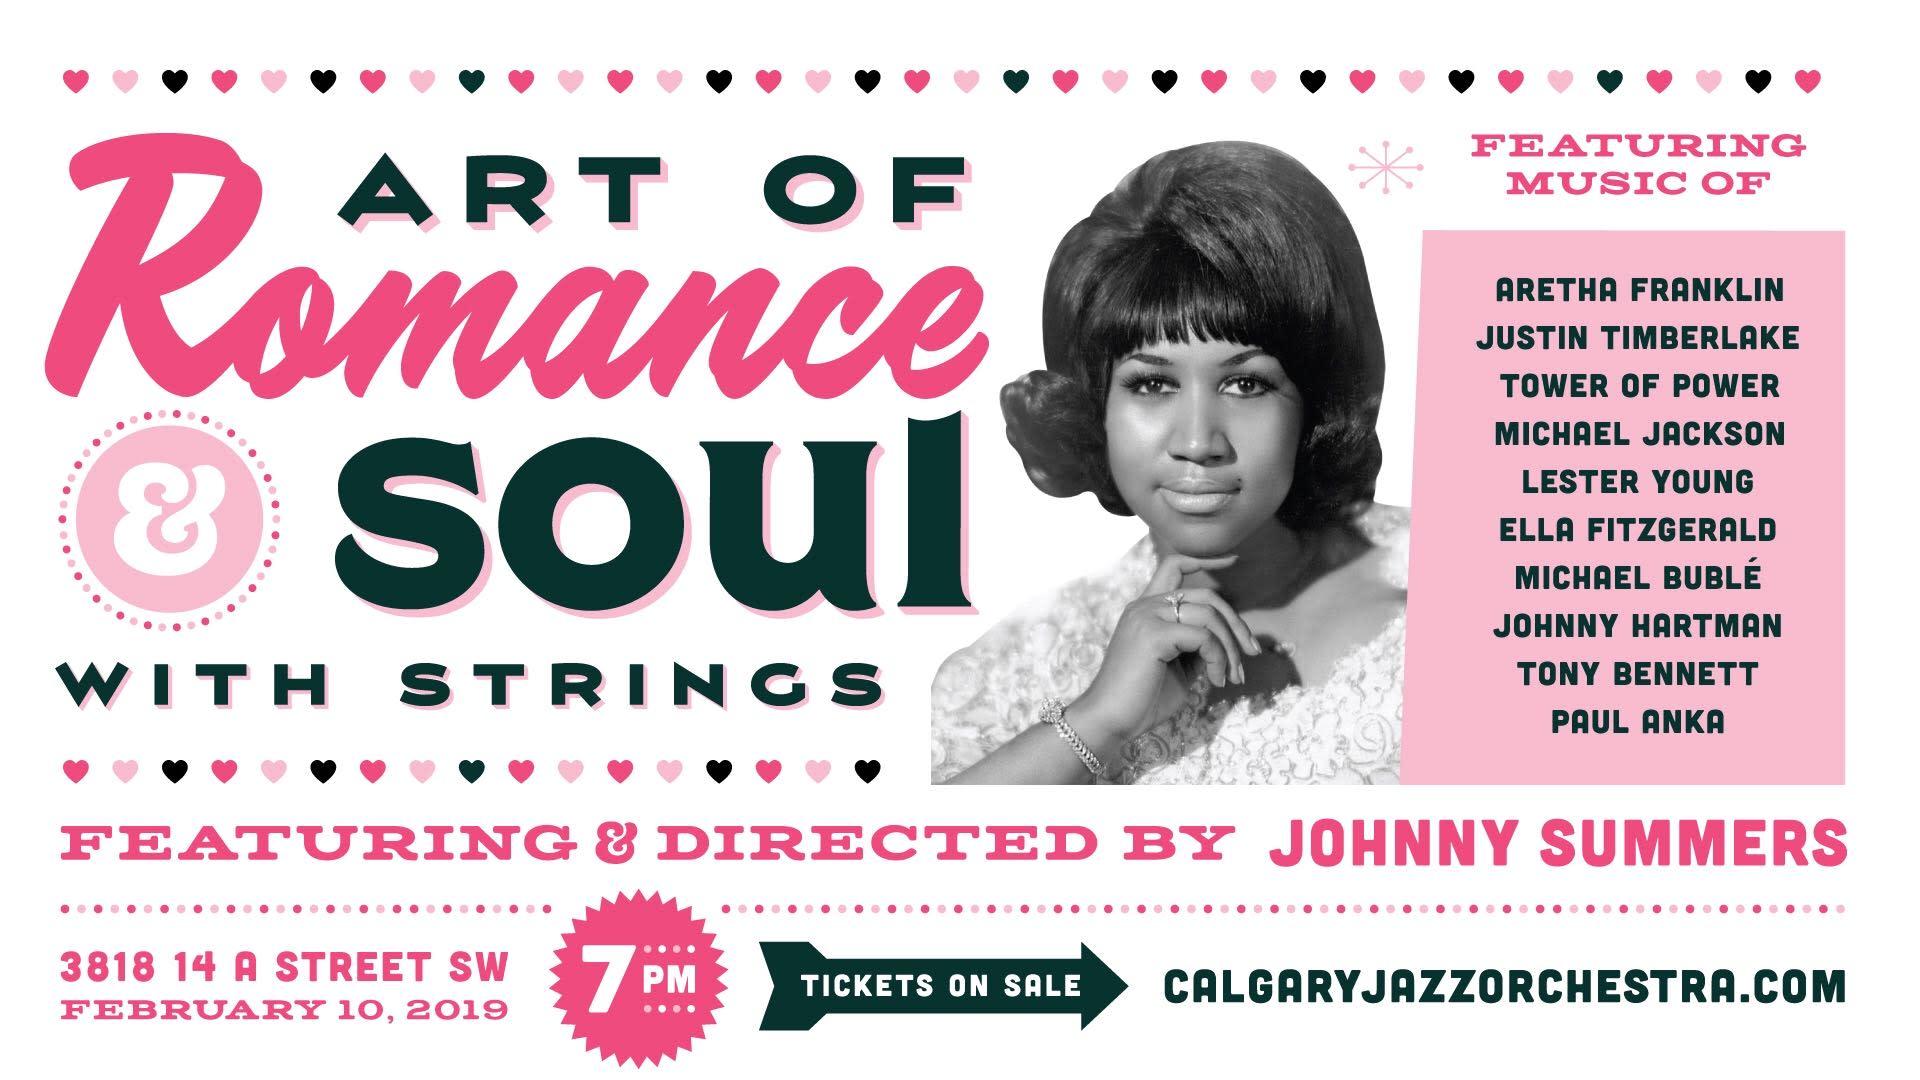 Calgary Jazz Orchestra presents: The Art of Romance, Art of Soul